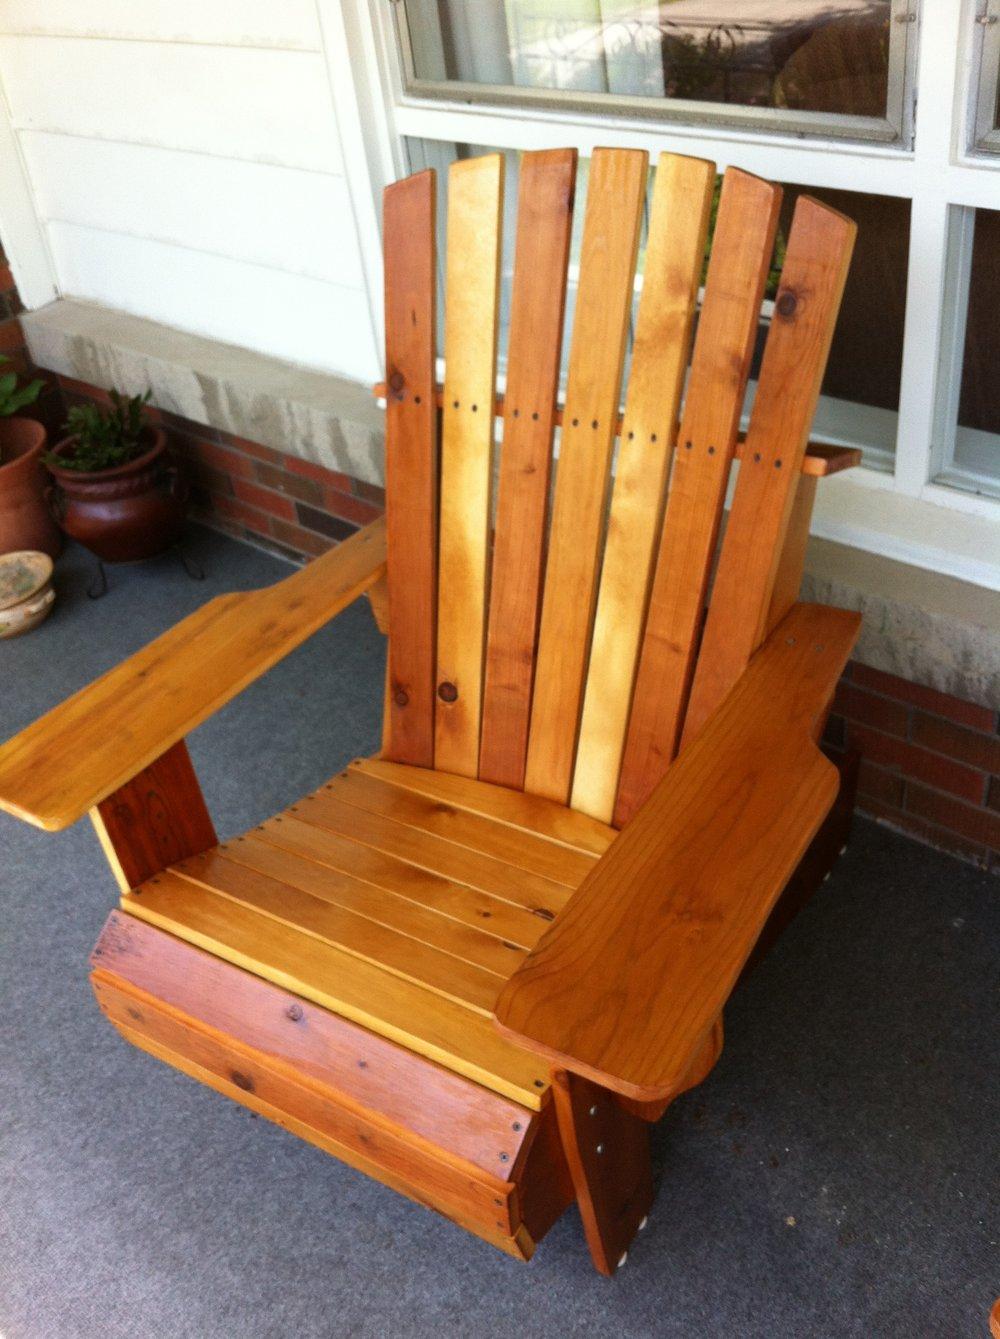 Muskoka Chair -